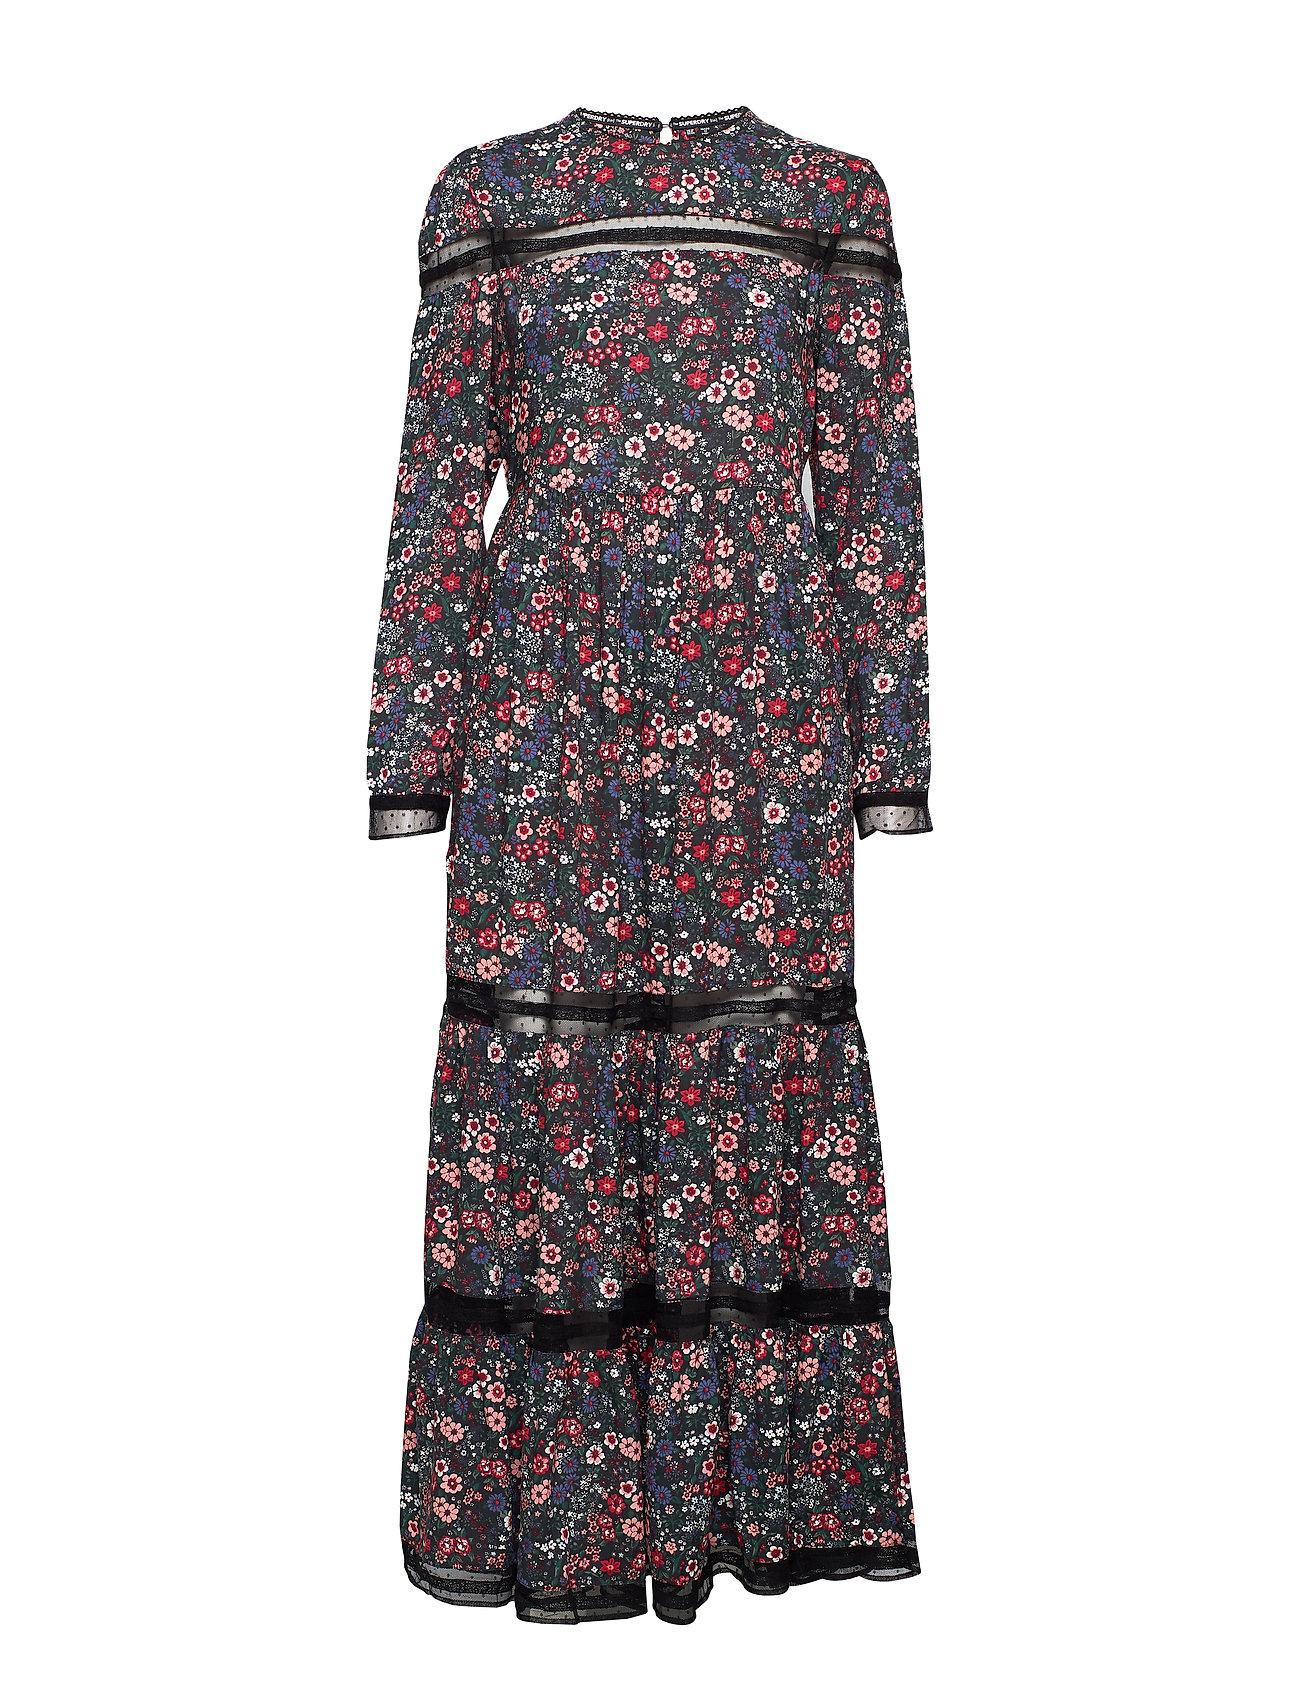 Superdry SKYLAR MAXI DRESS - JANIE FLORAL PRINT